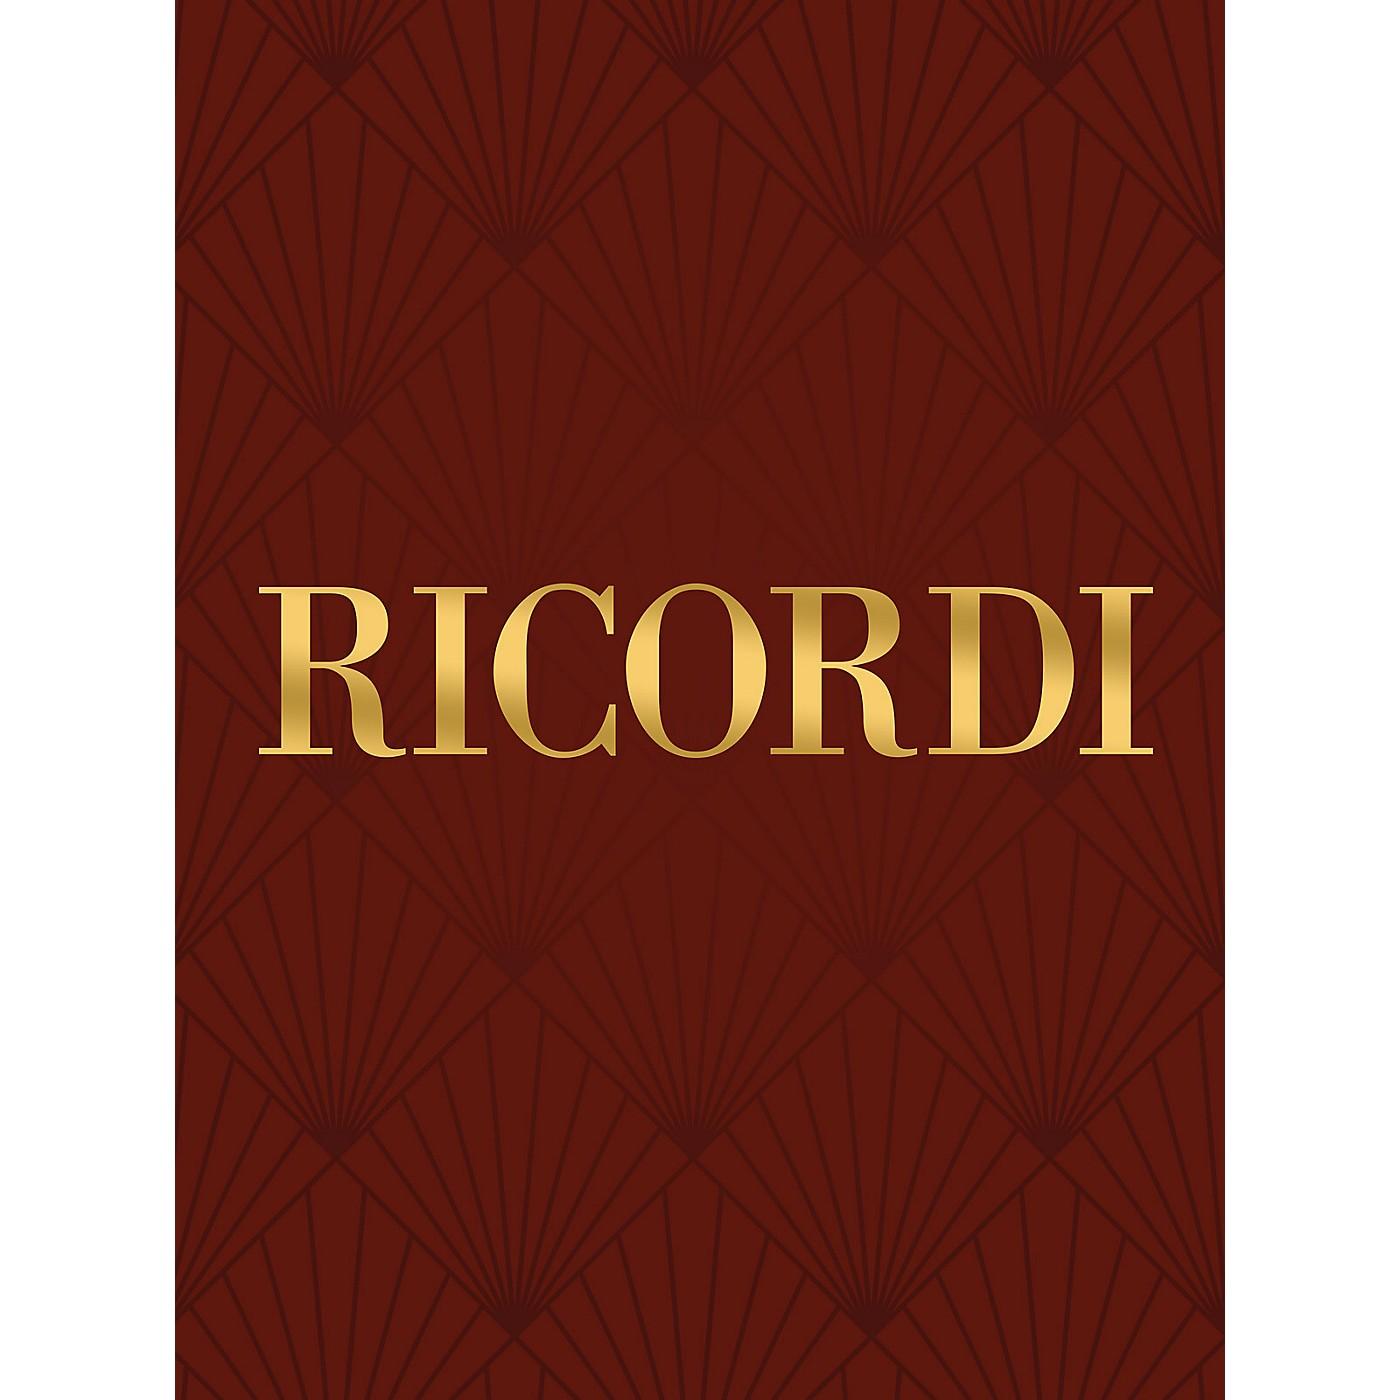 Ricordi Una furtiva lagrima (from L'elisir d'amore) (Voice and Piano) Vocal Solo Series by Gaetano Donizetti thumbnail